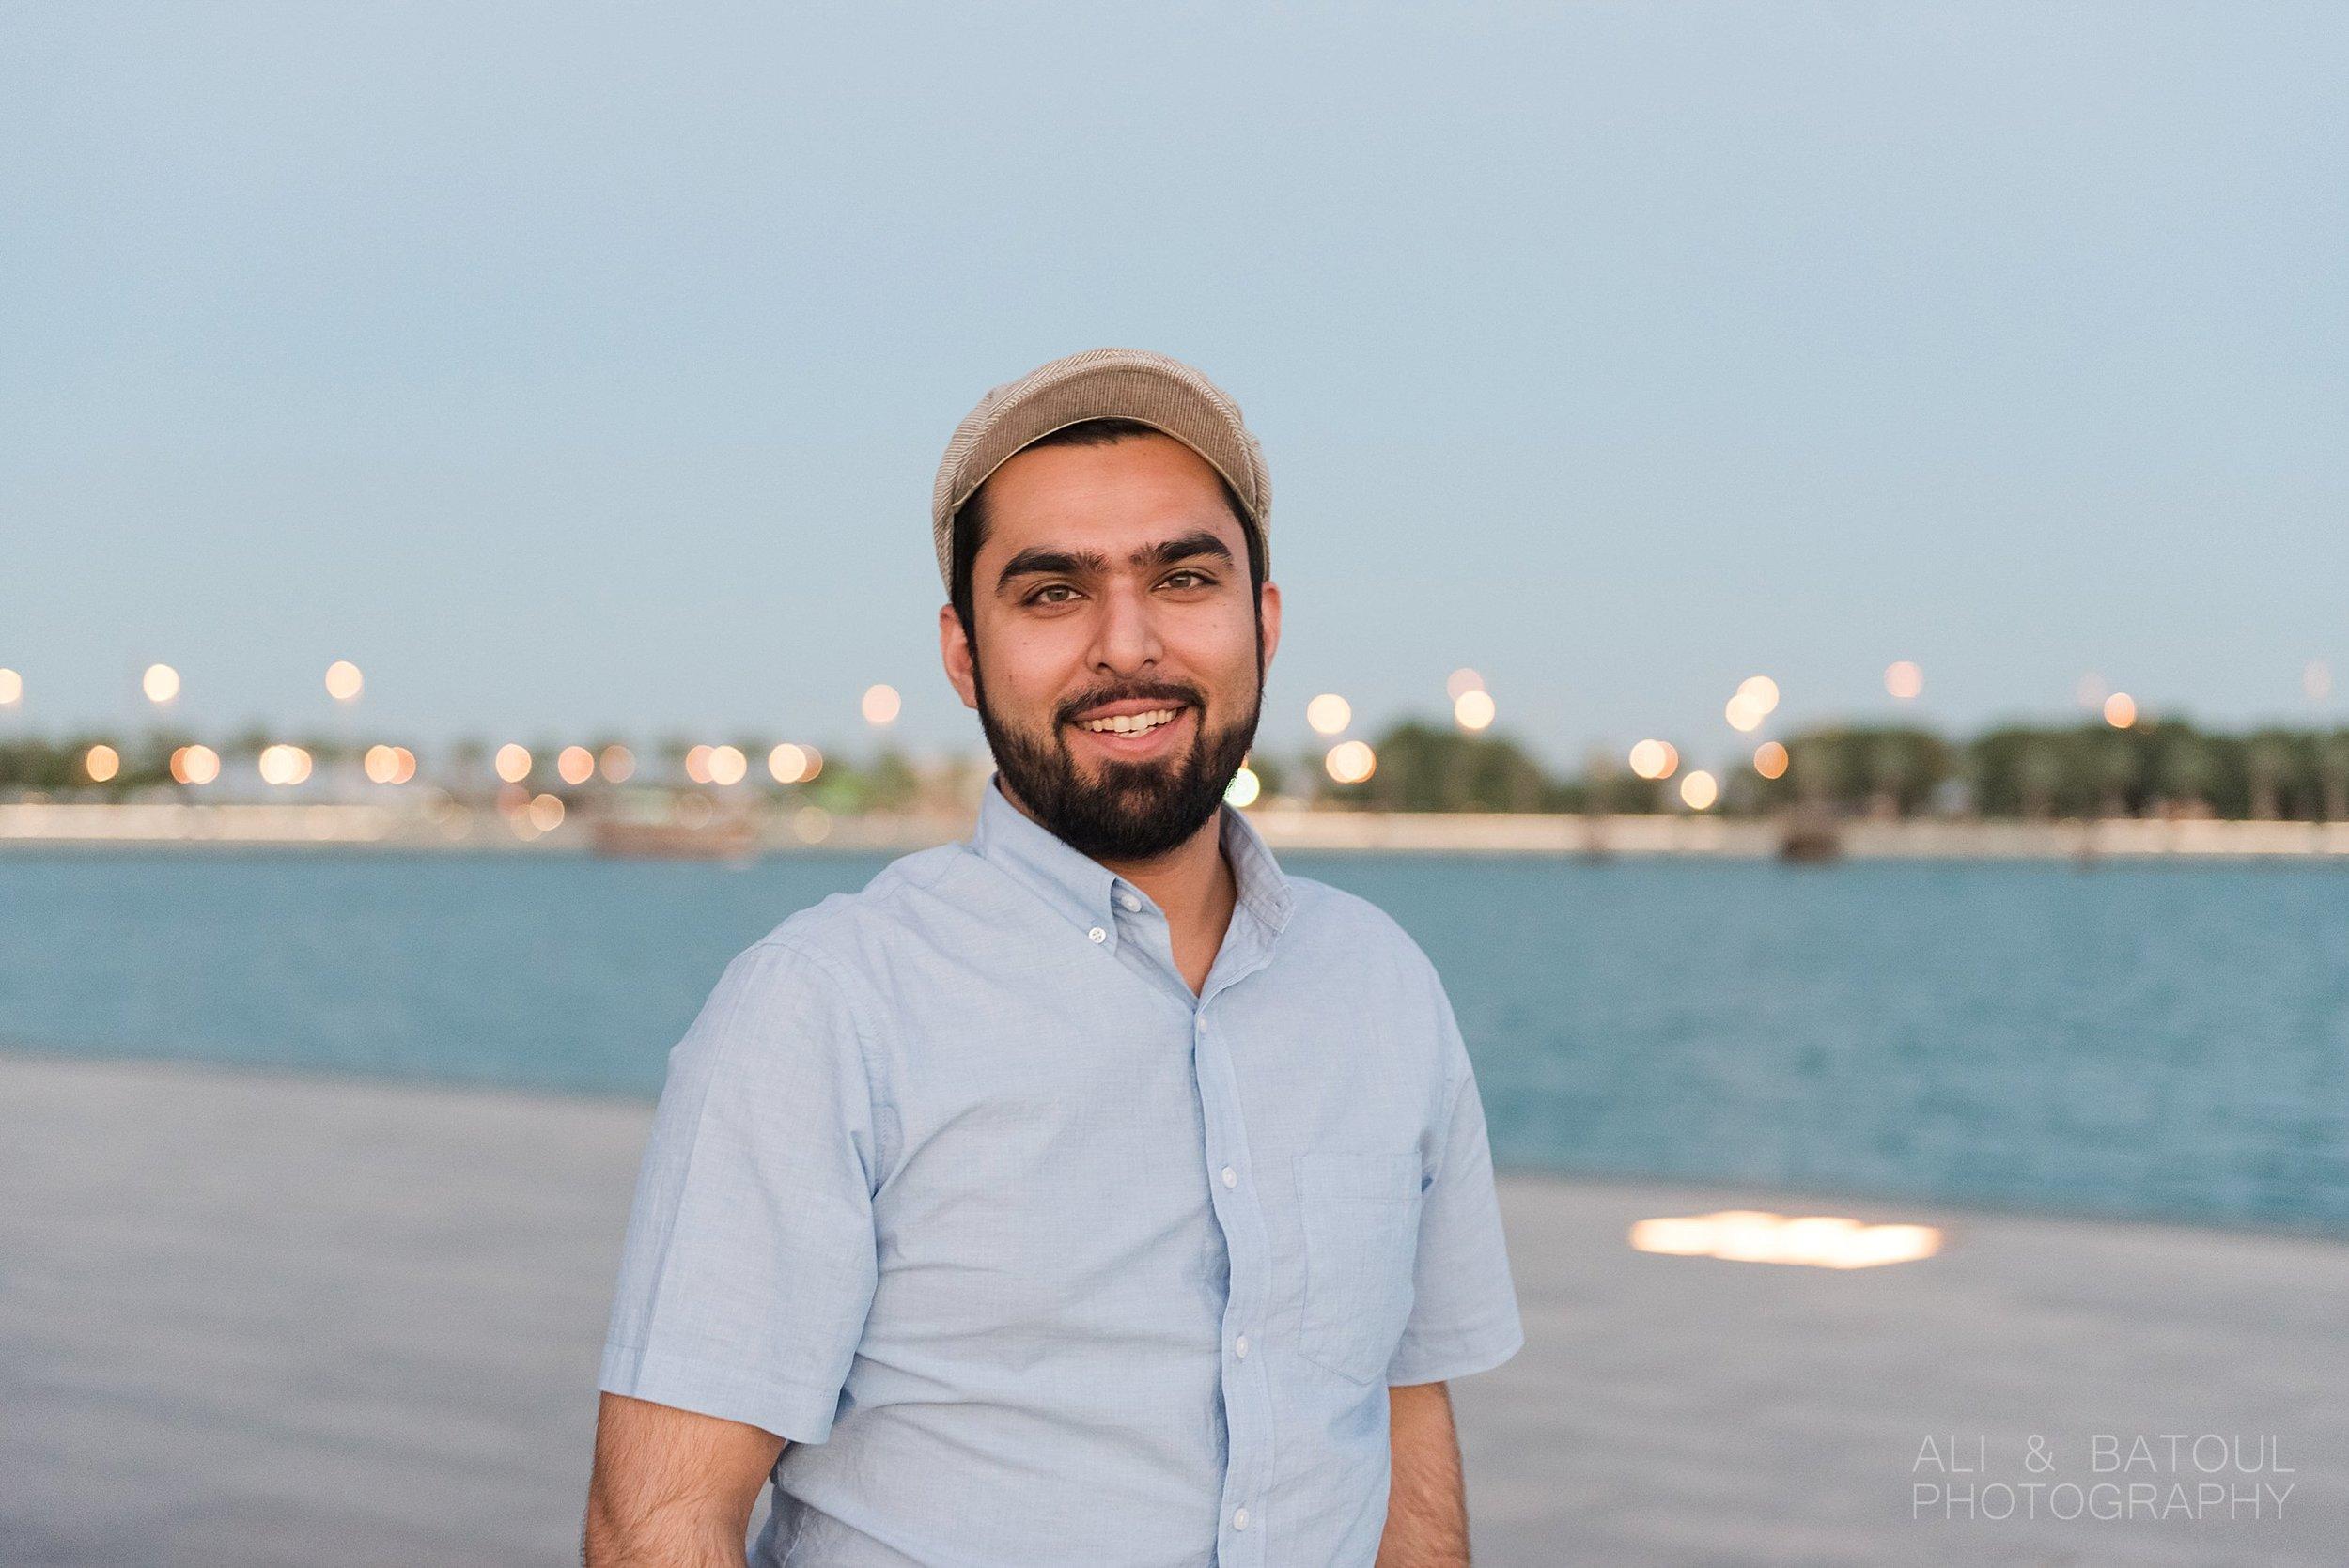 Ali & Batoul Photography - Doha Travel Photography_0054.jpg